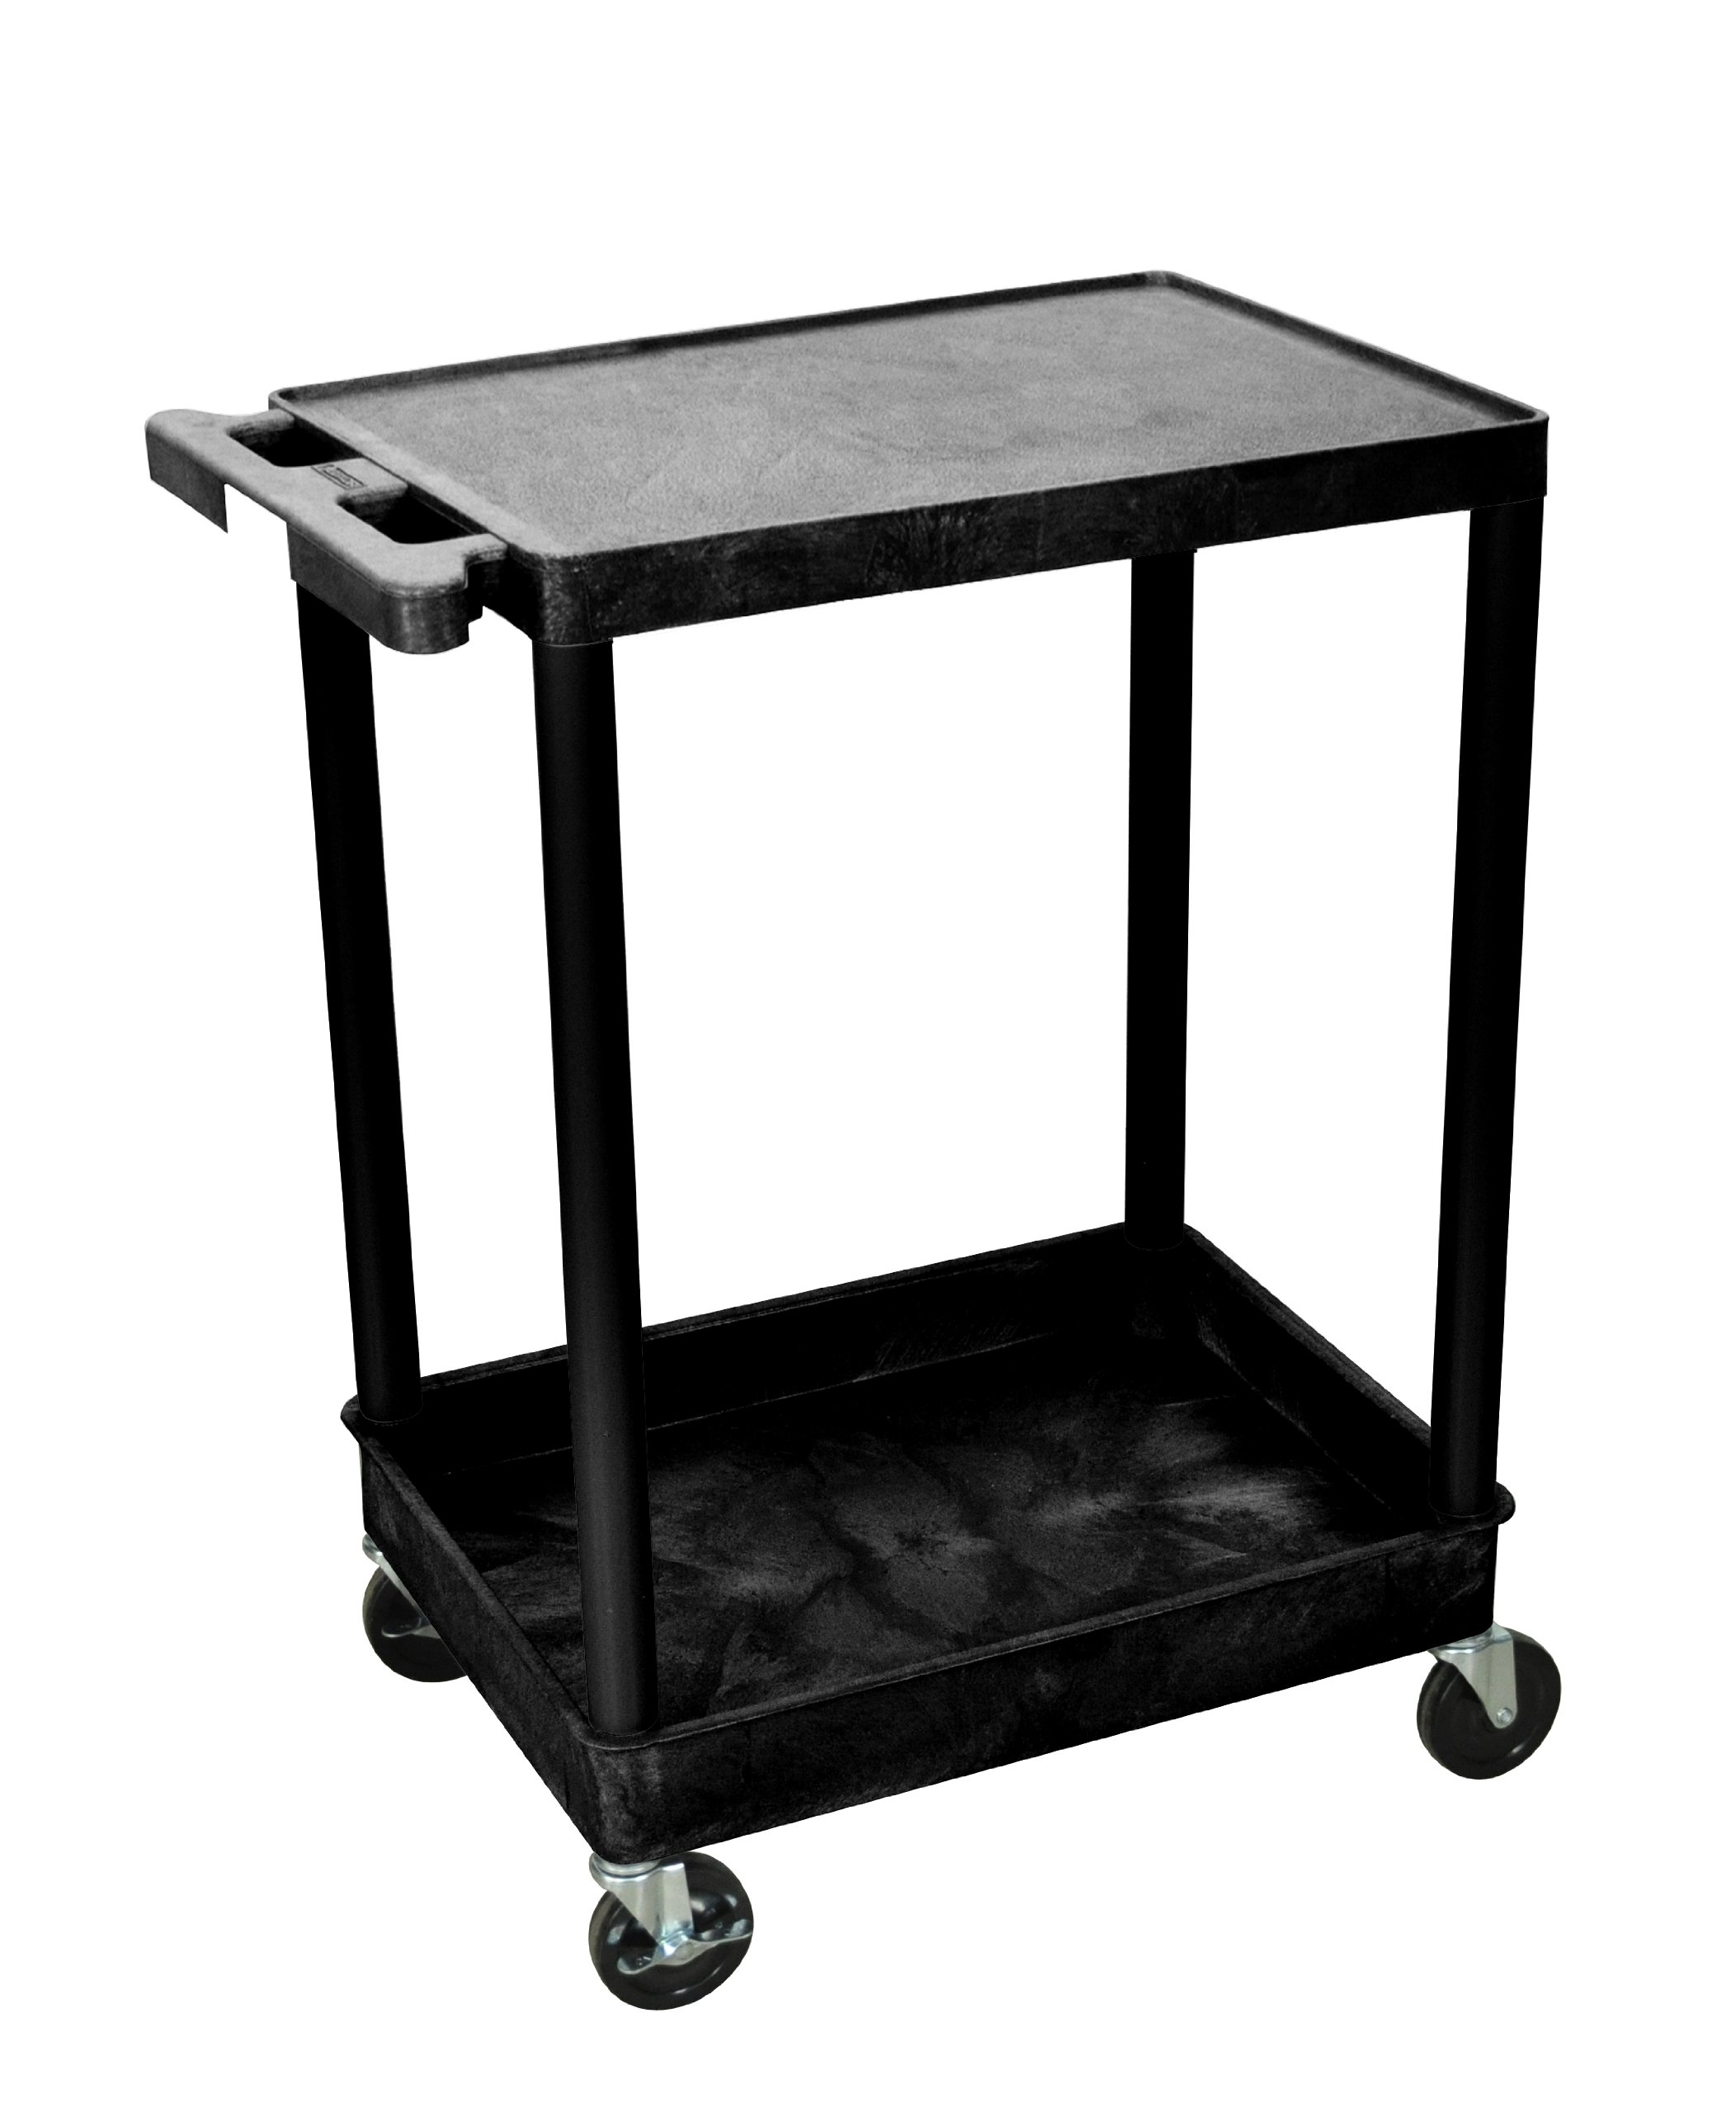 H Wilson STC21-B STC Series 18 x 24 Inch 2-Shelf Utility Cart, Black